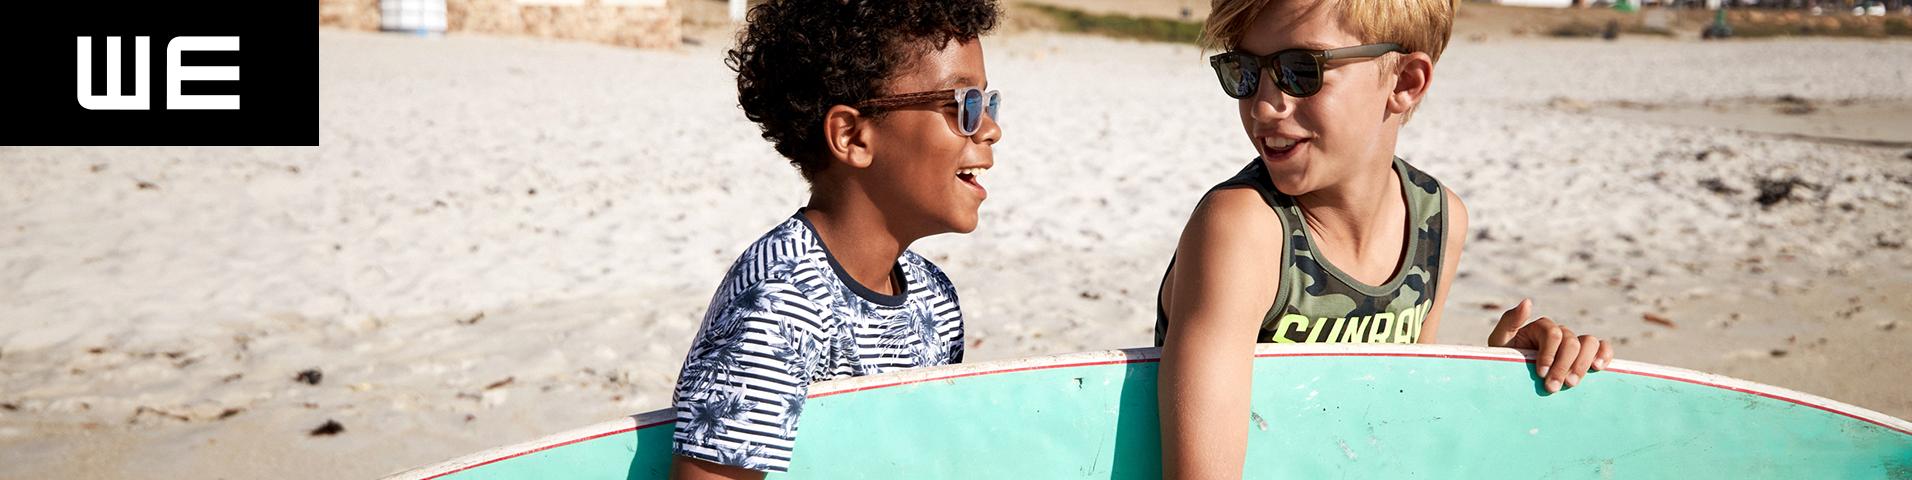 Aparte Kinderkleding.We Fashion Kinderkleding Online Kopen Gratis Verzending Zalando